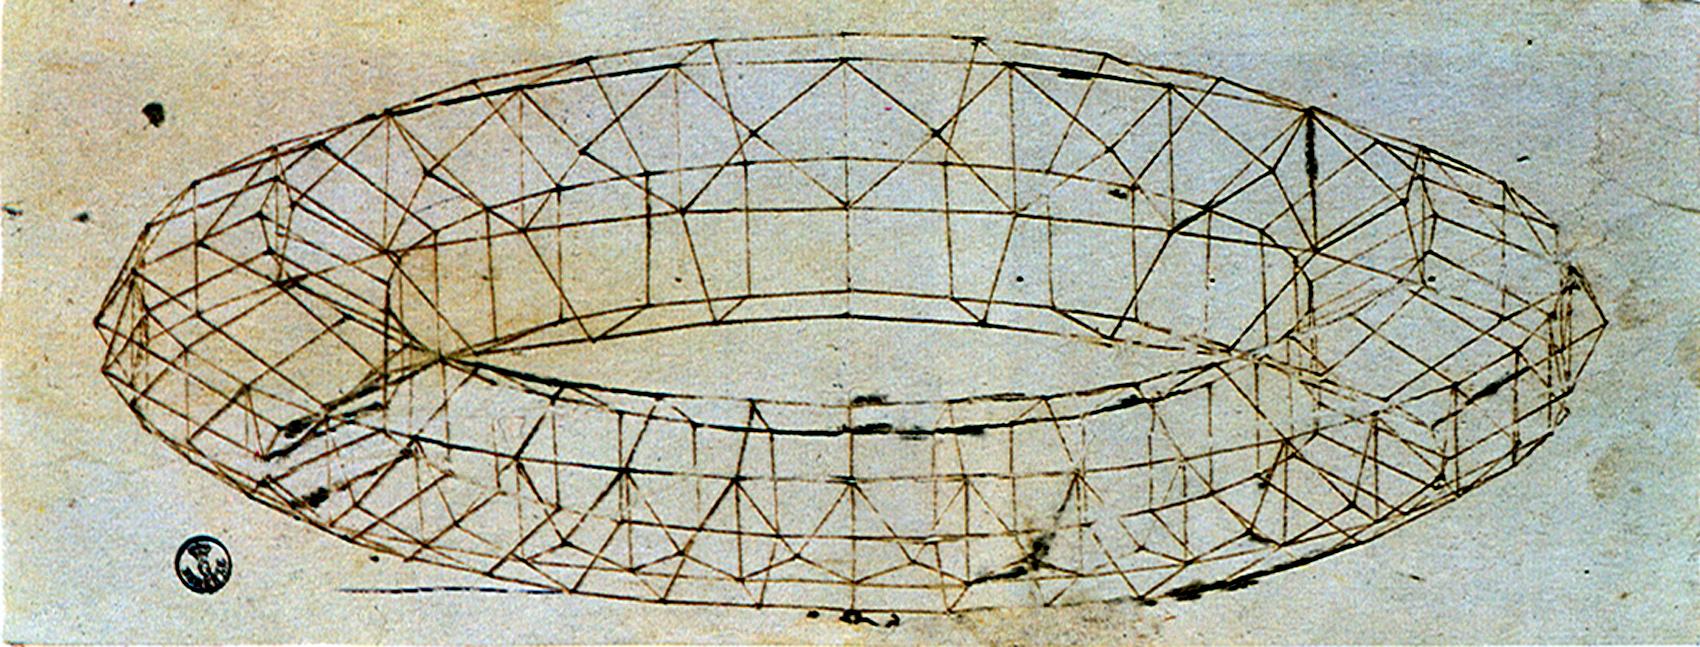 perspective study of mazzocchio - paolo uccello